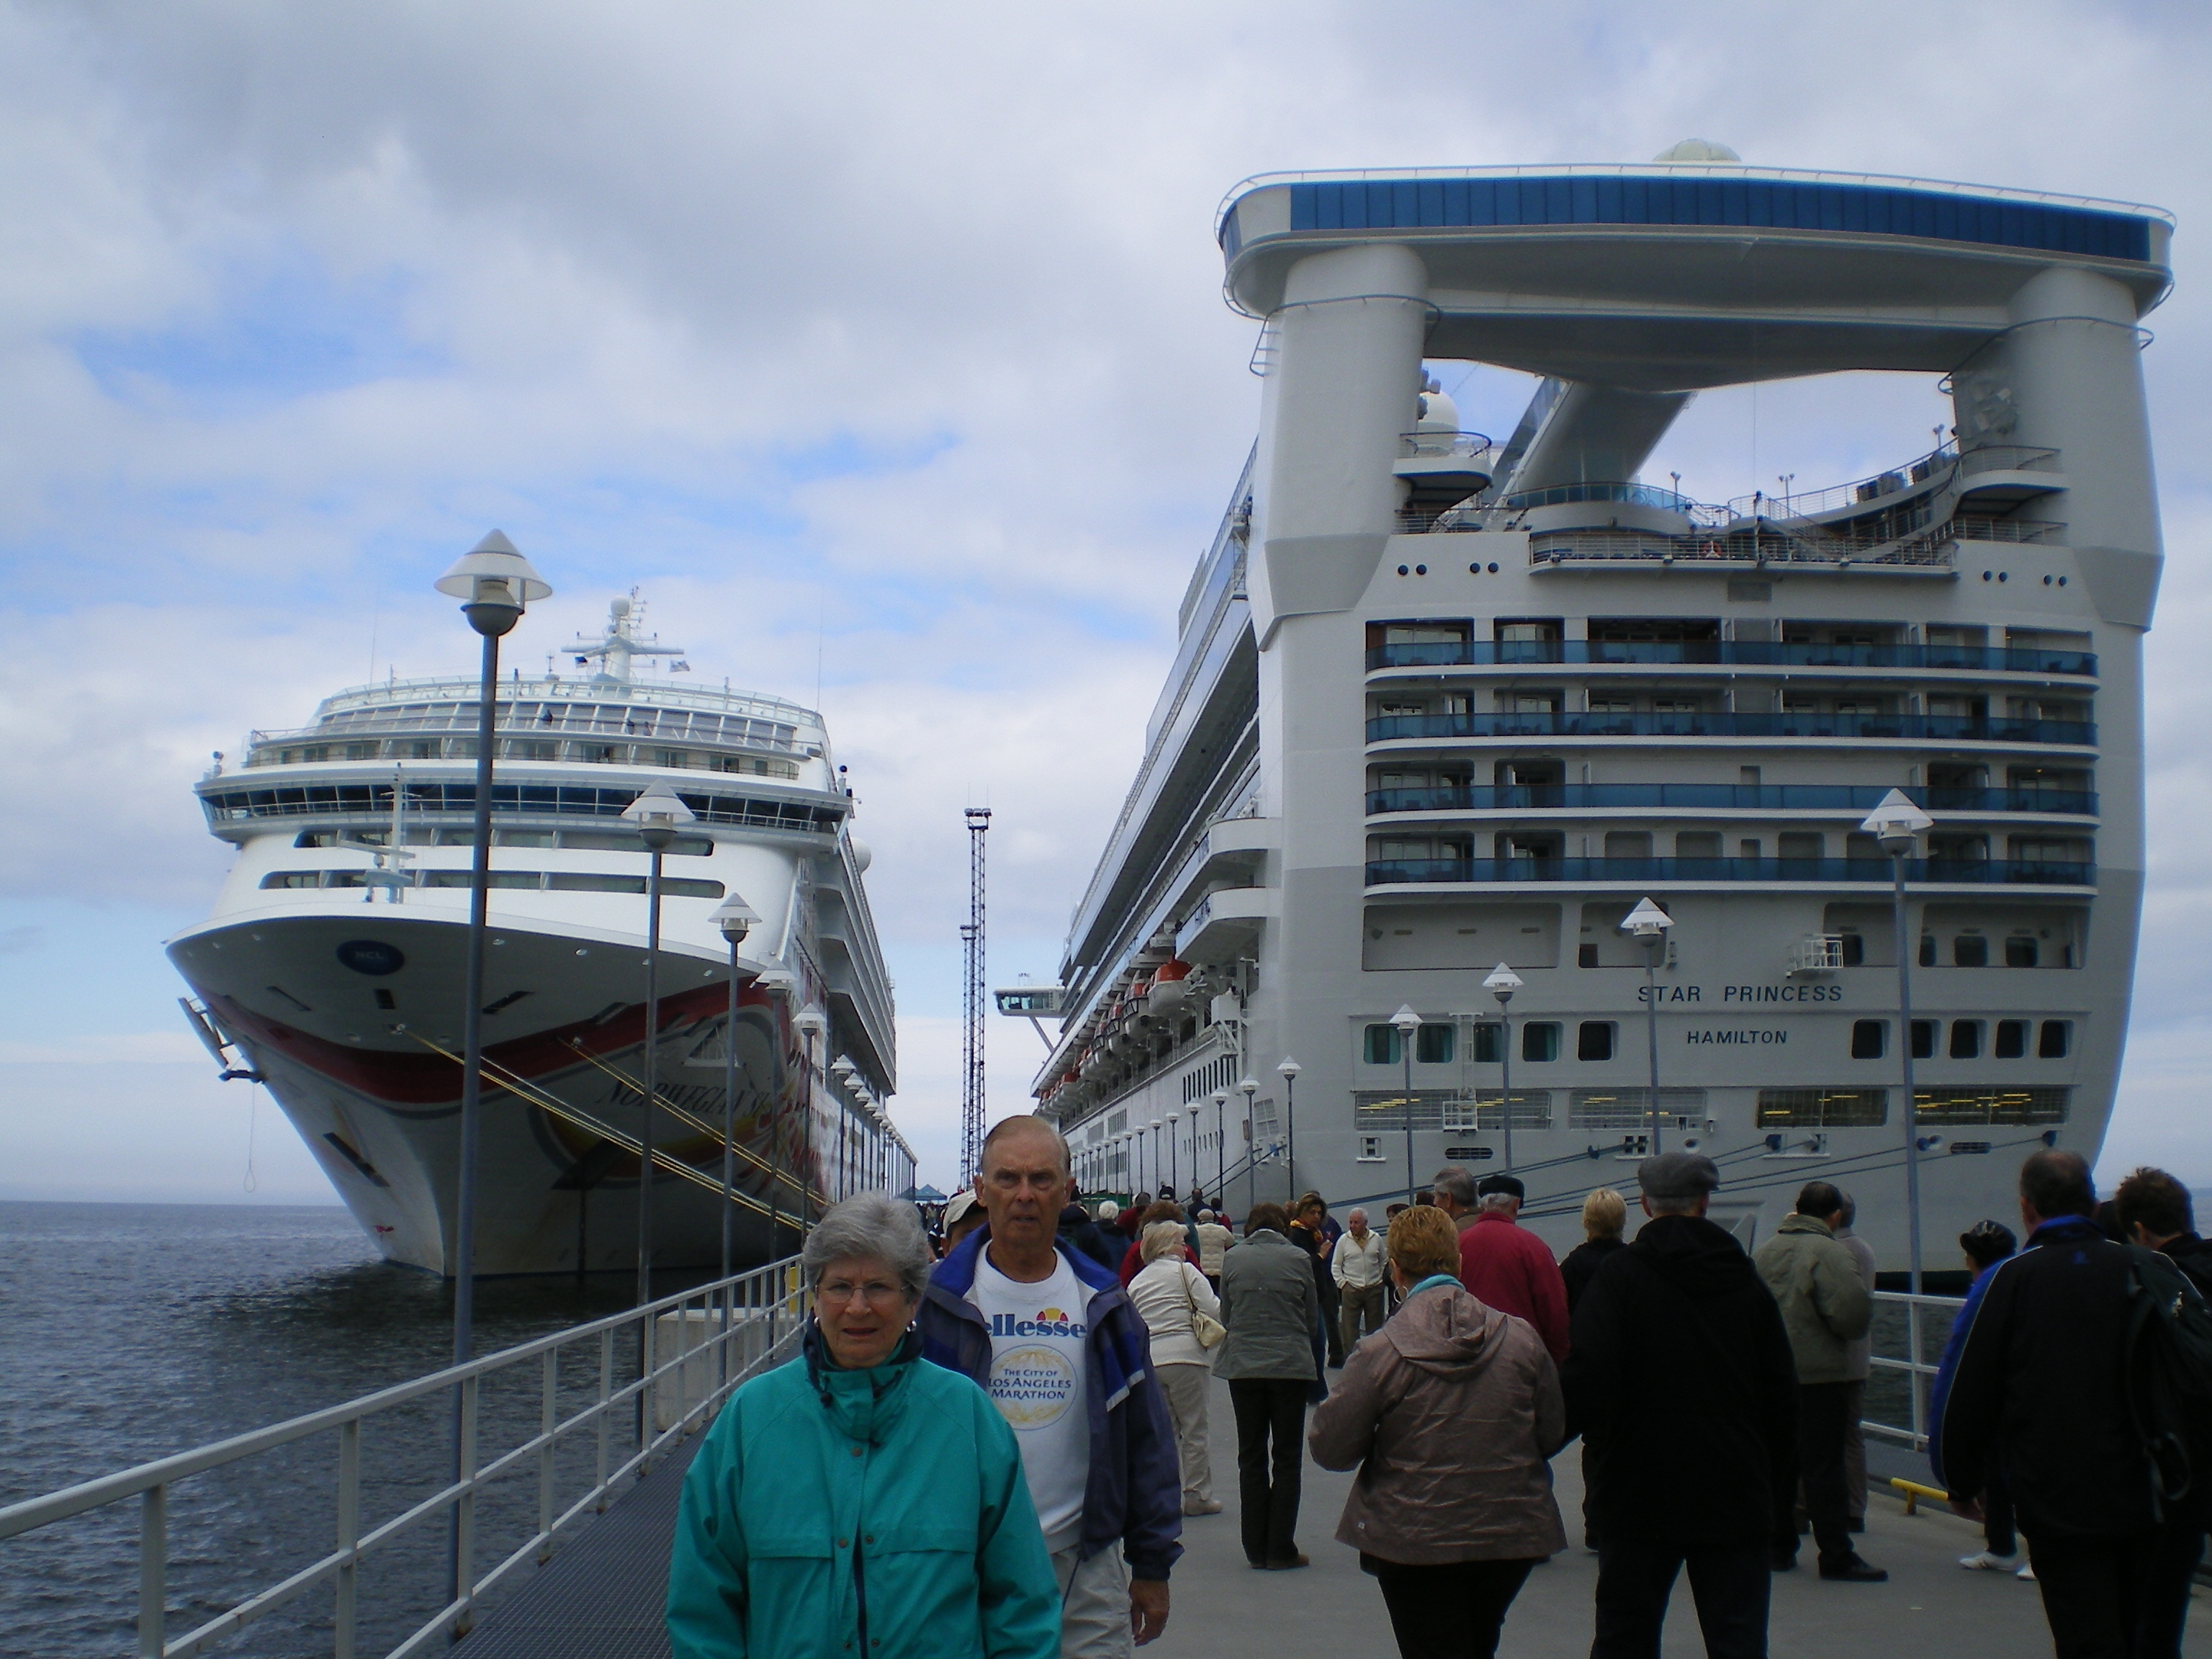 FileNorwegian Sun Star Princessjpg Wikimedia Commons - Princess cruise ship fire